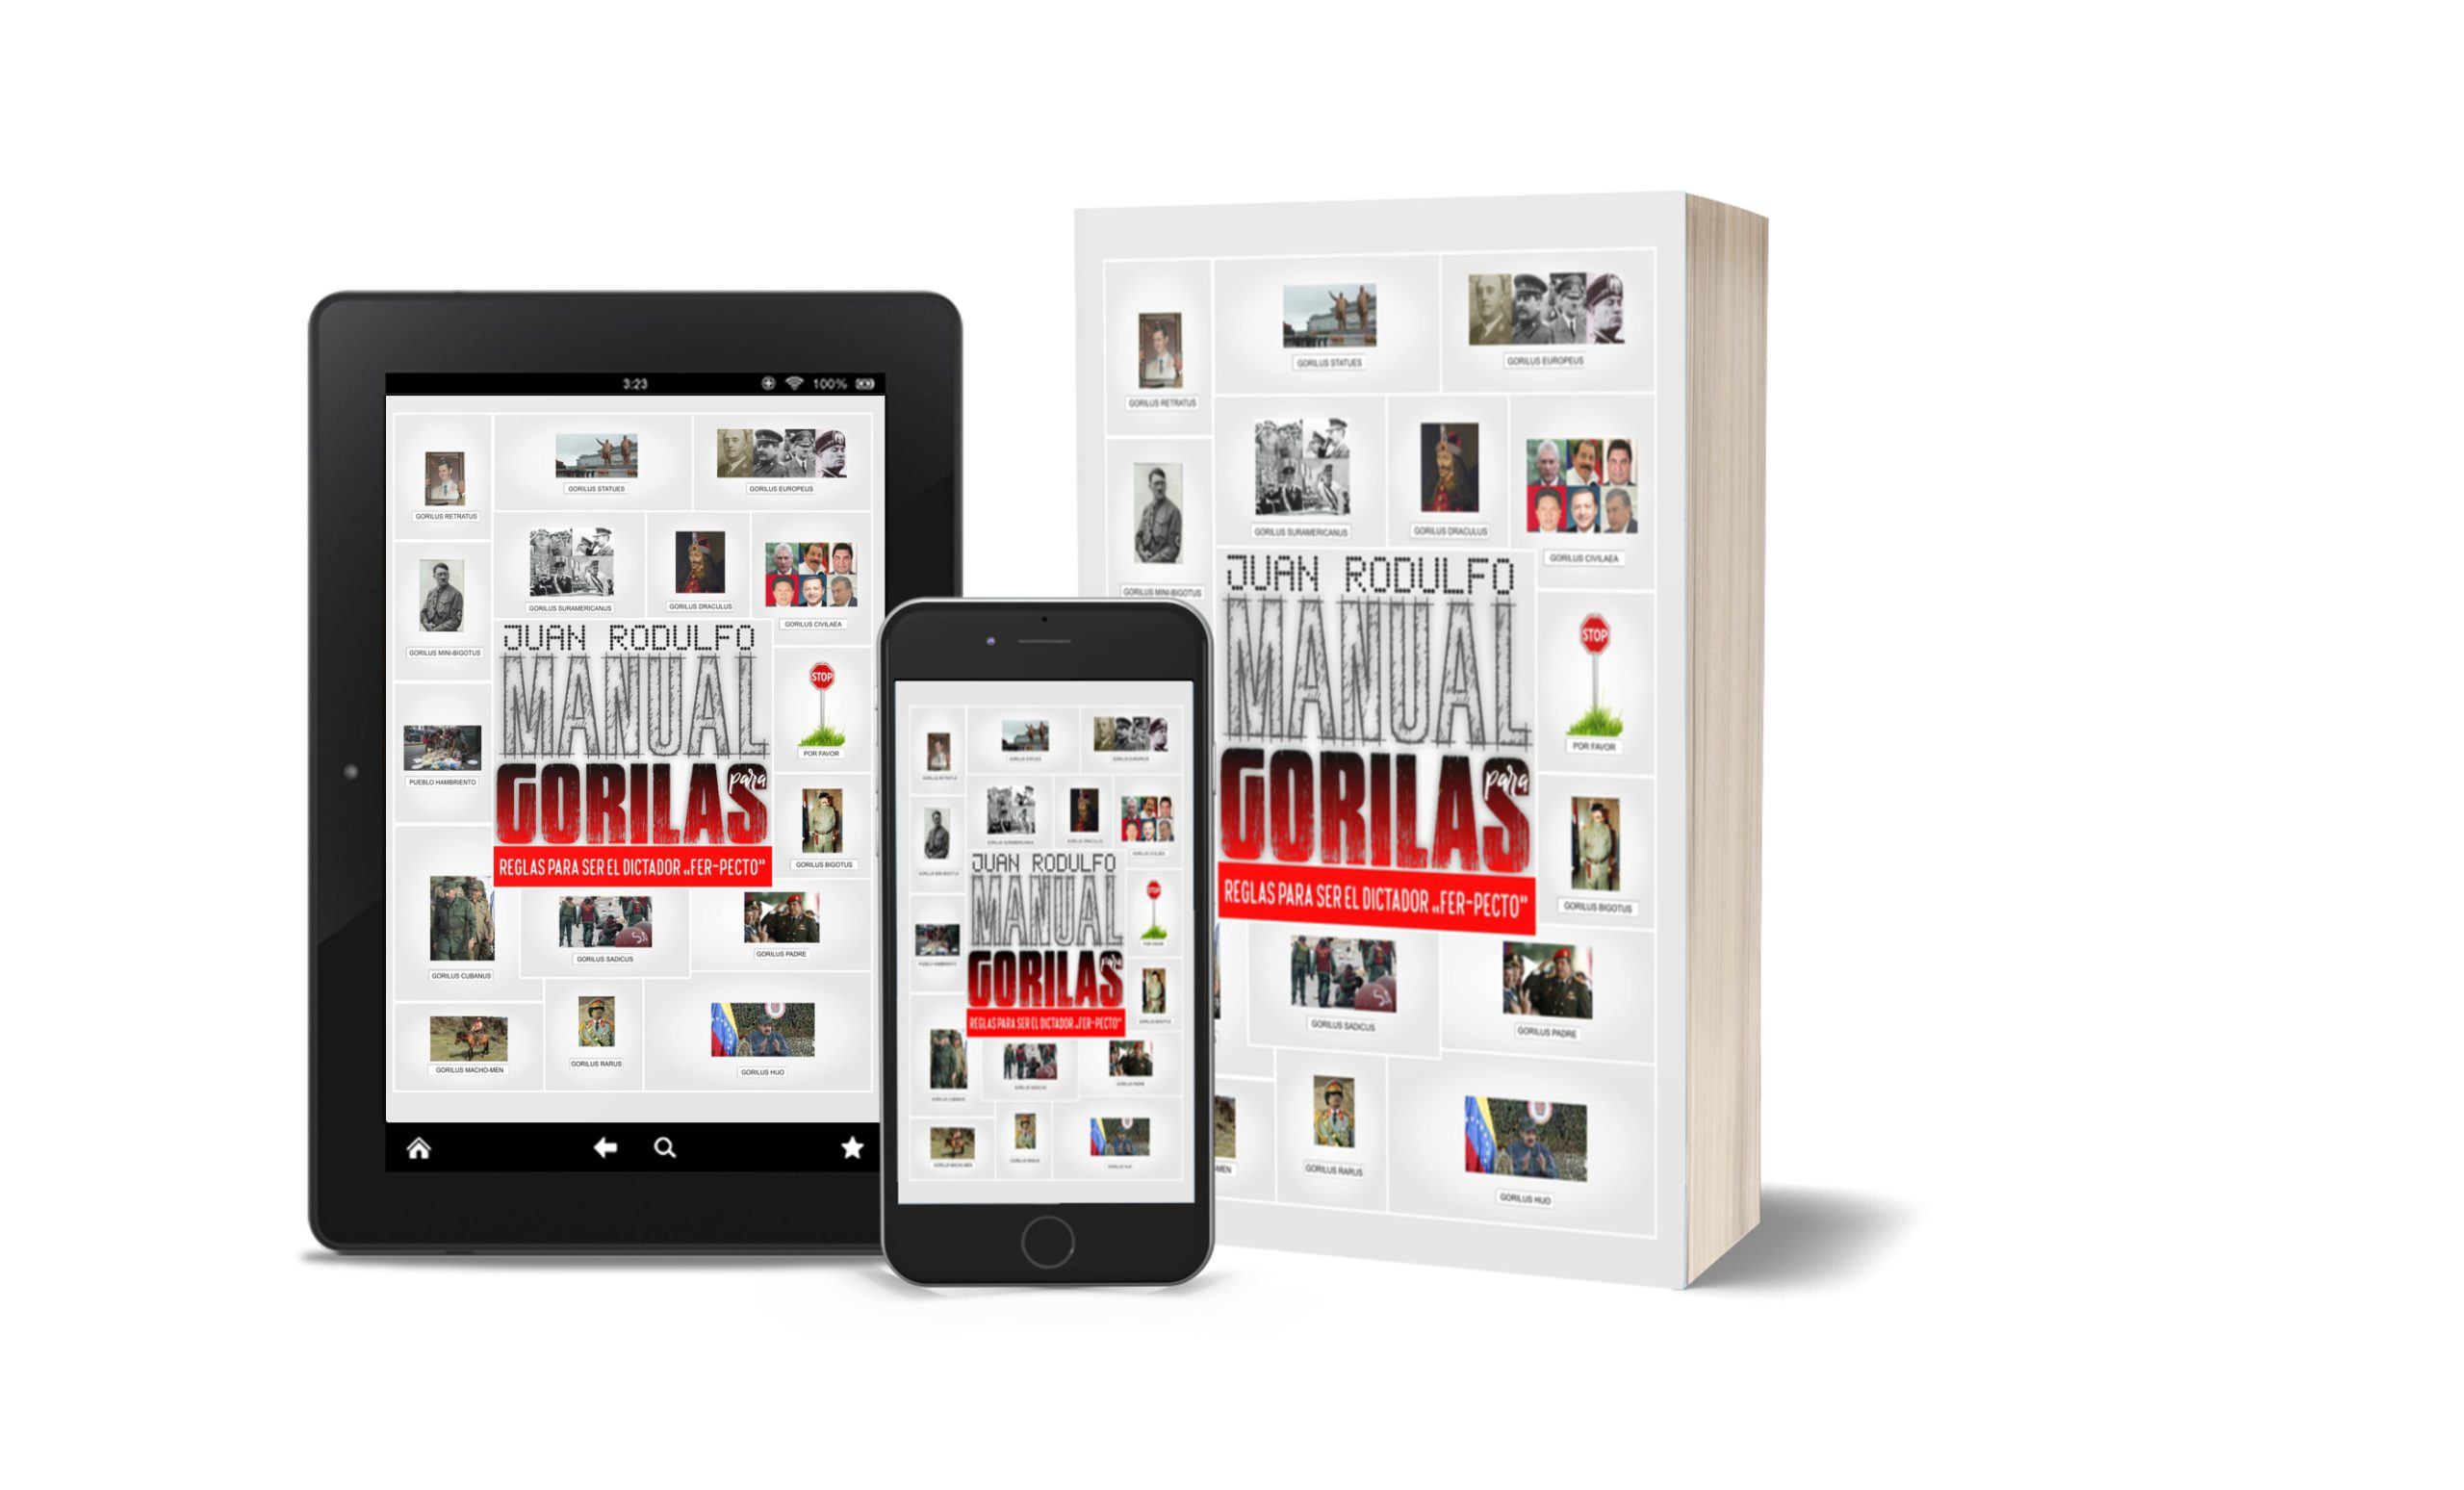 Manual para Gorilas de Juan Rodulfo